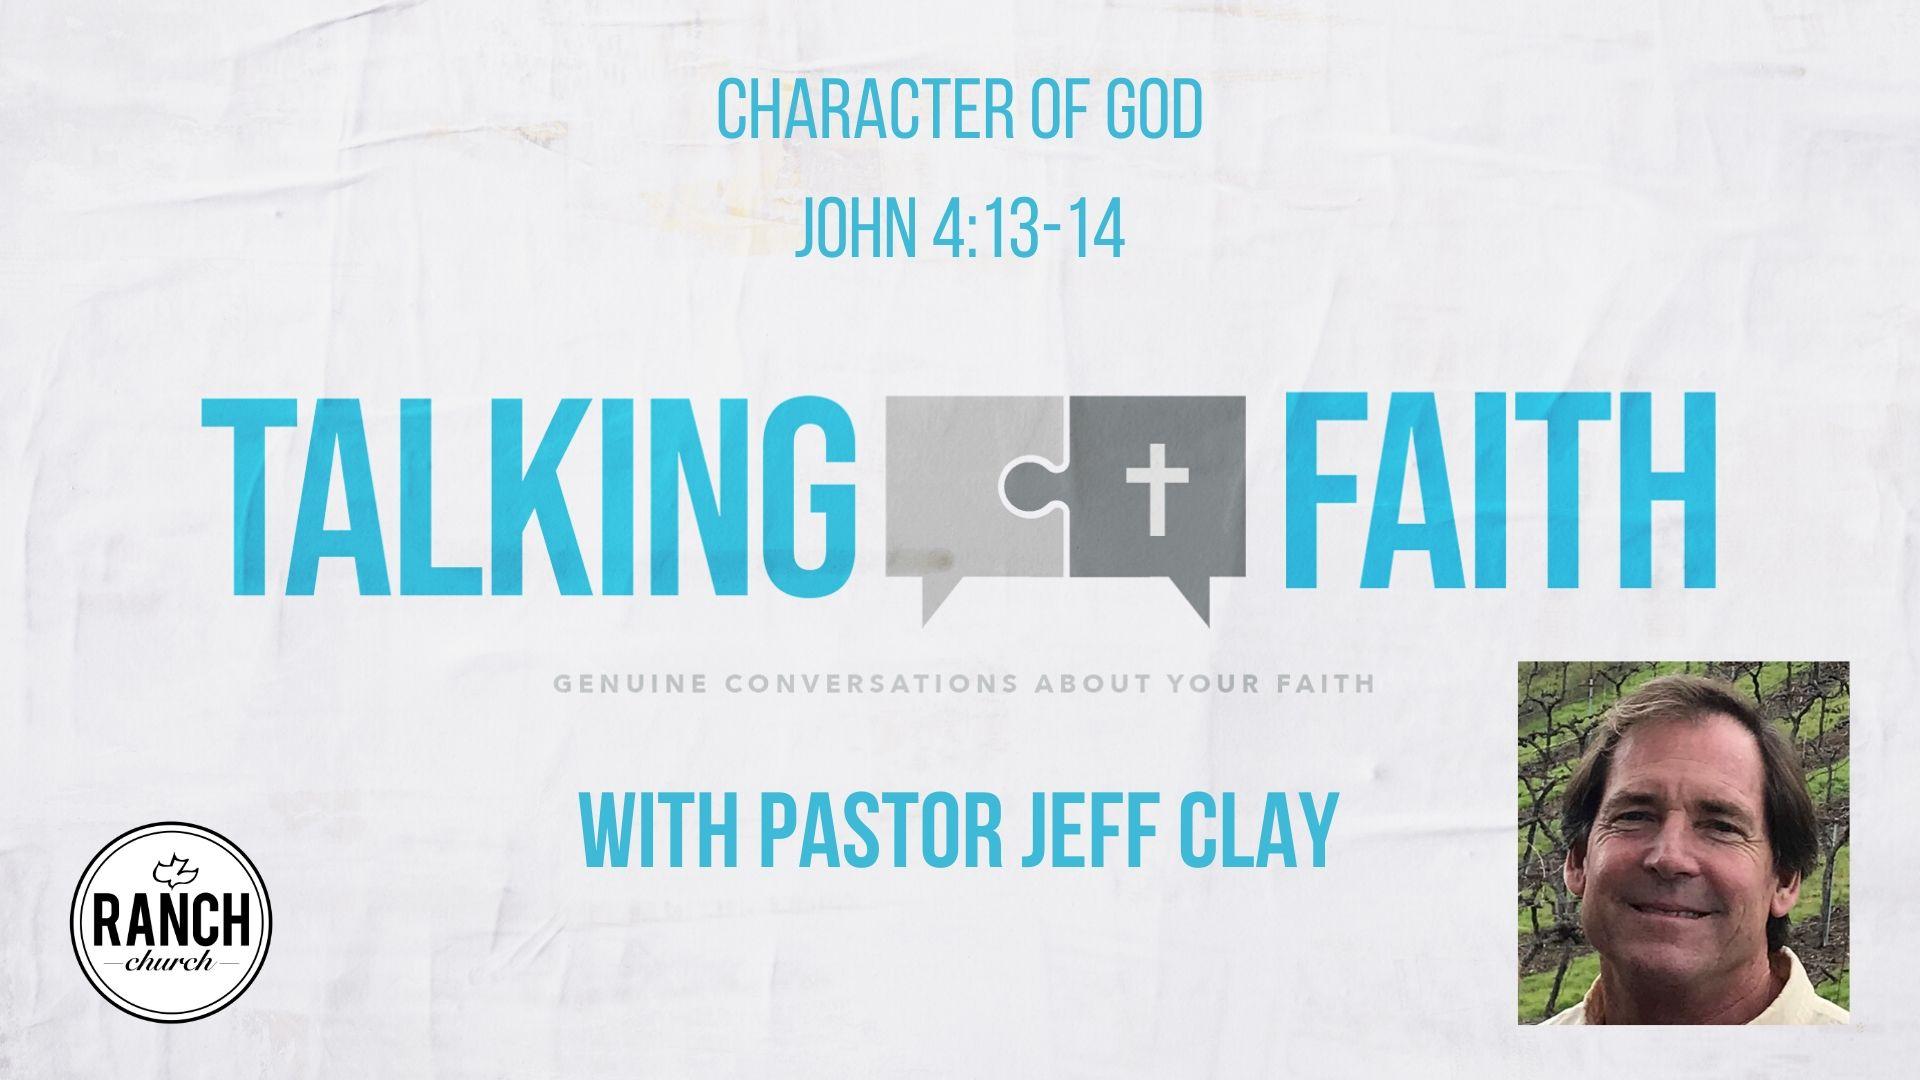 TALKING FAITH 5-12-2020